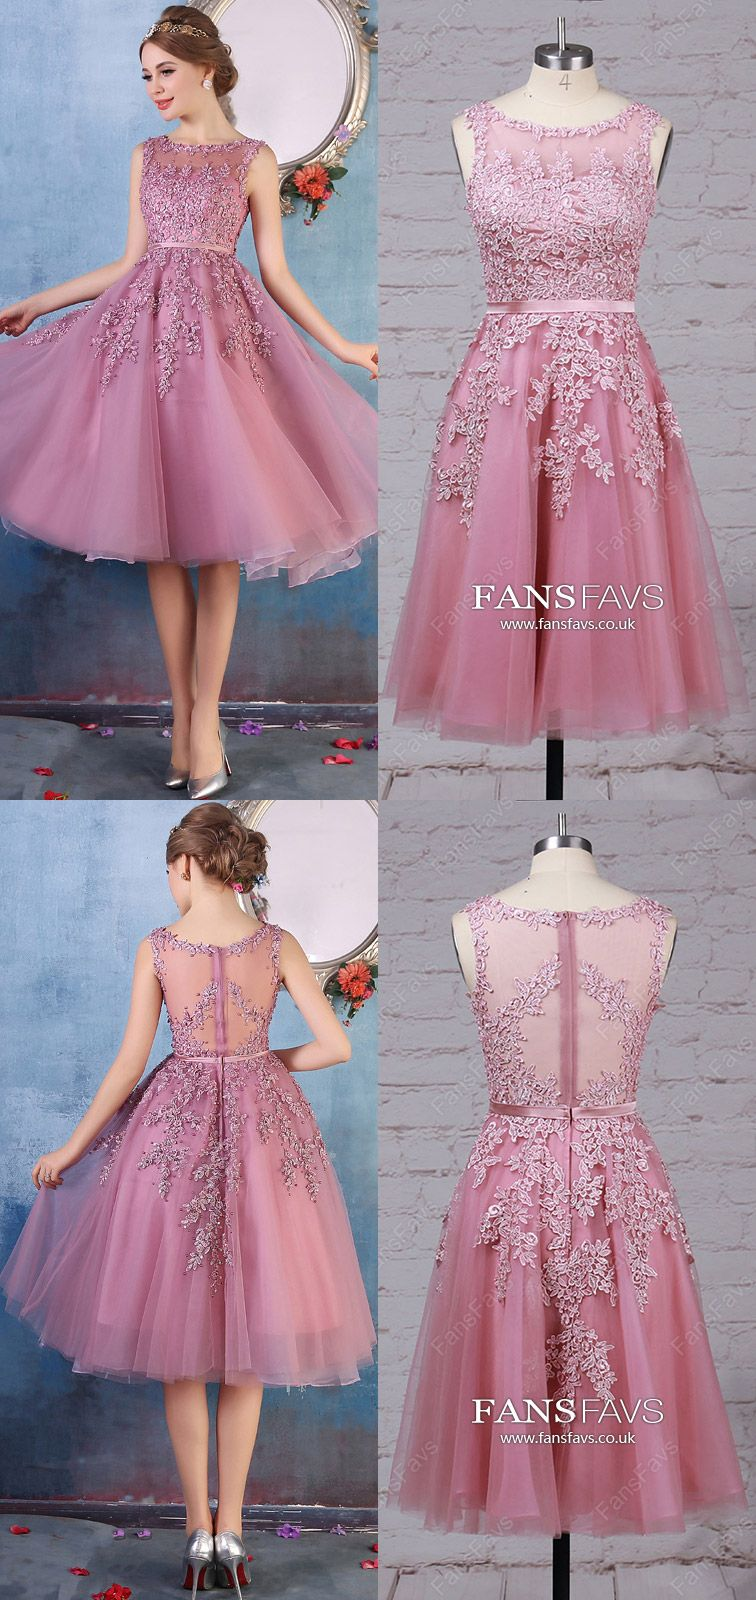 Pink Homecoming DressesShort Prom DressesJunior Homecoming Dresses